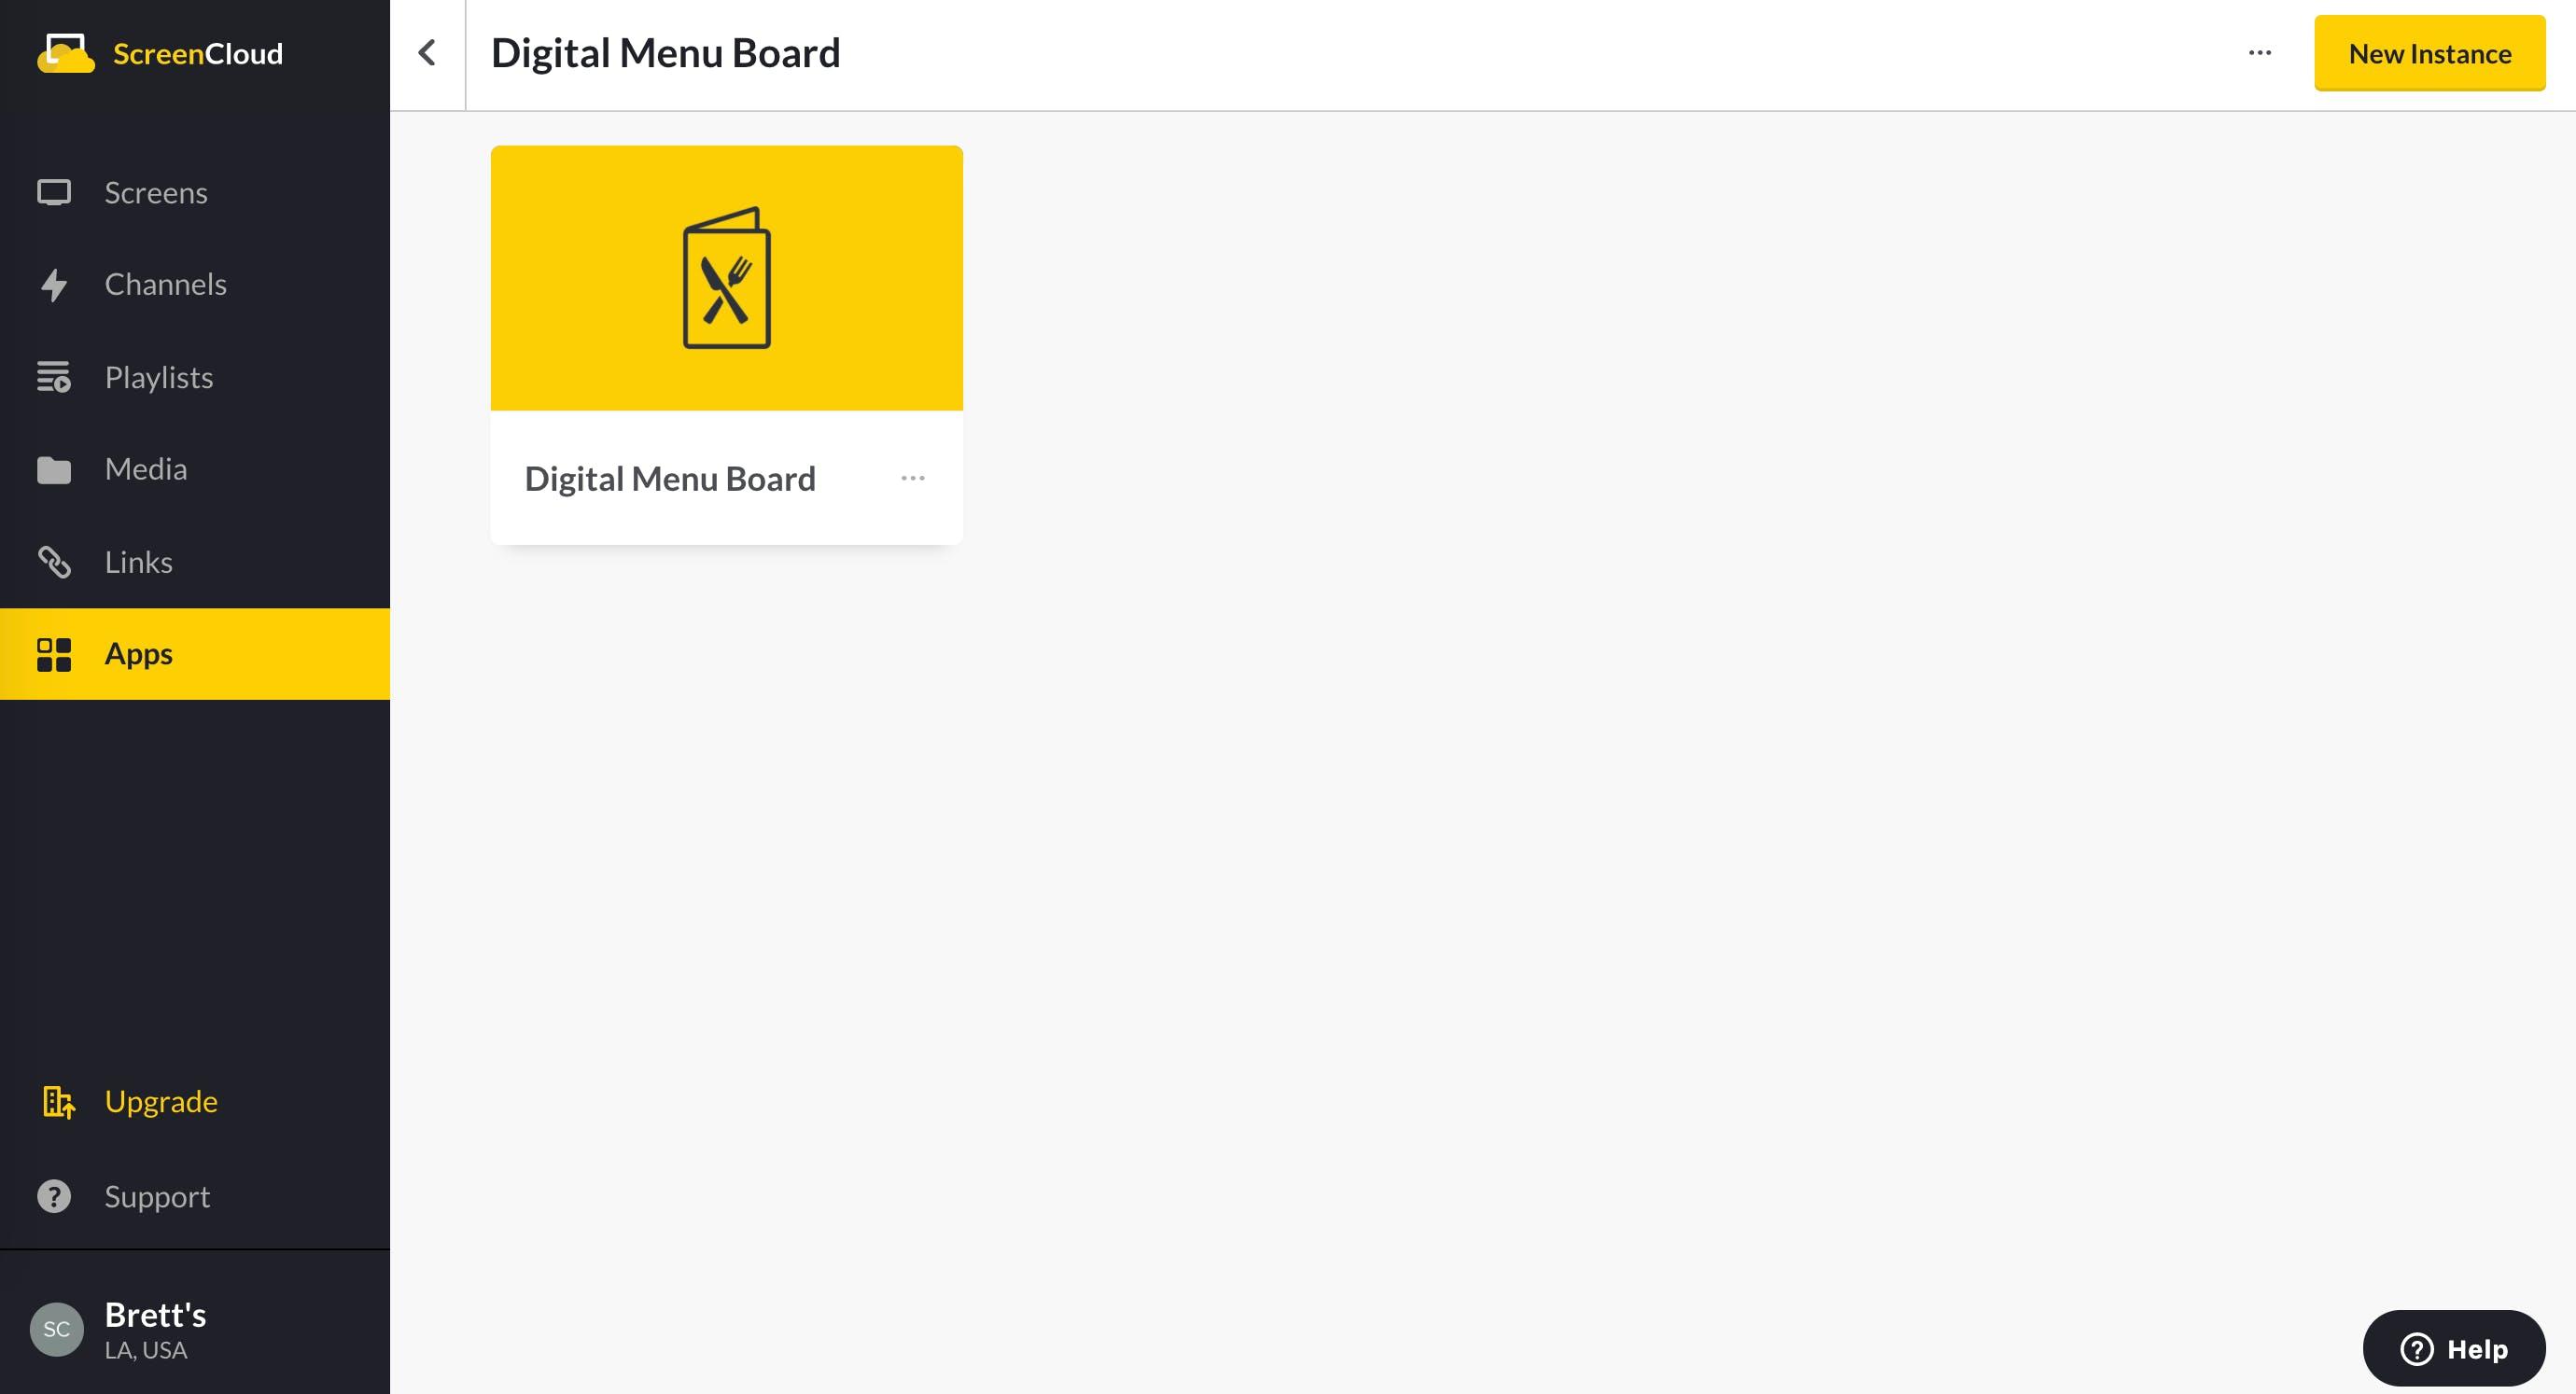 Digital Menu Board App guide - App instance 5.13.2020.png